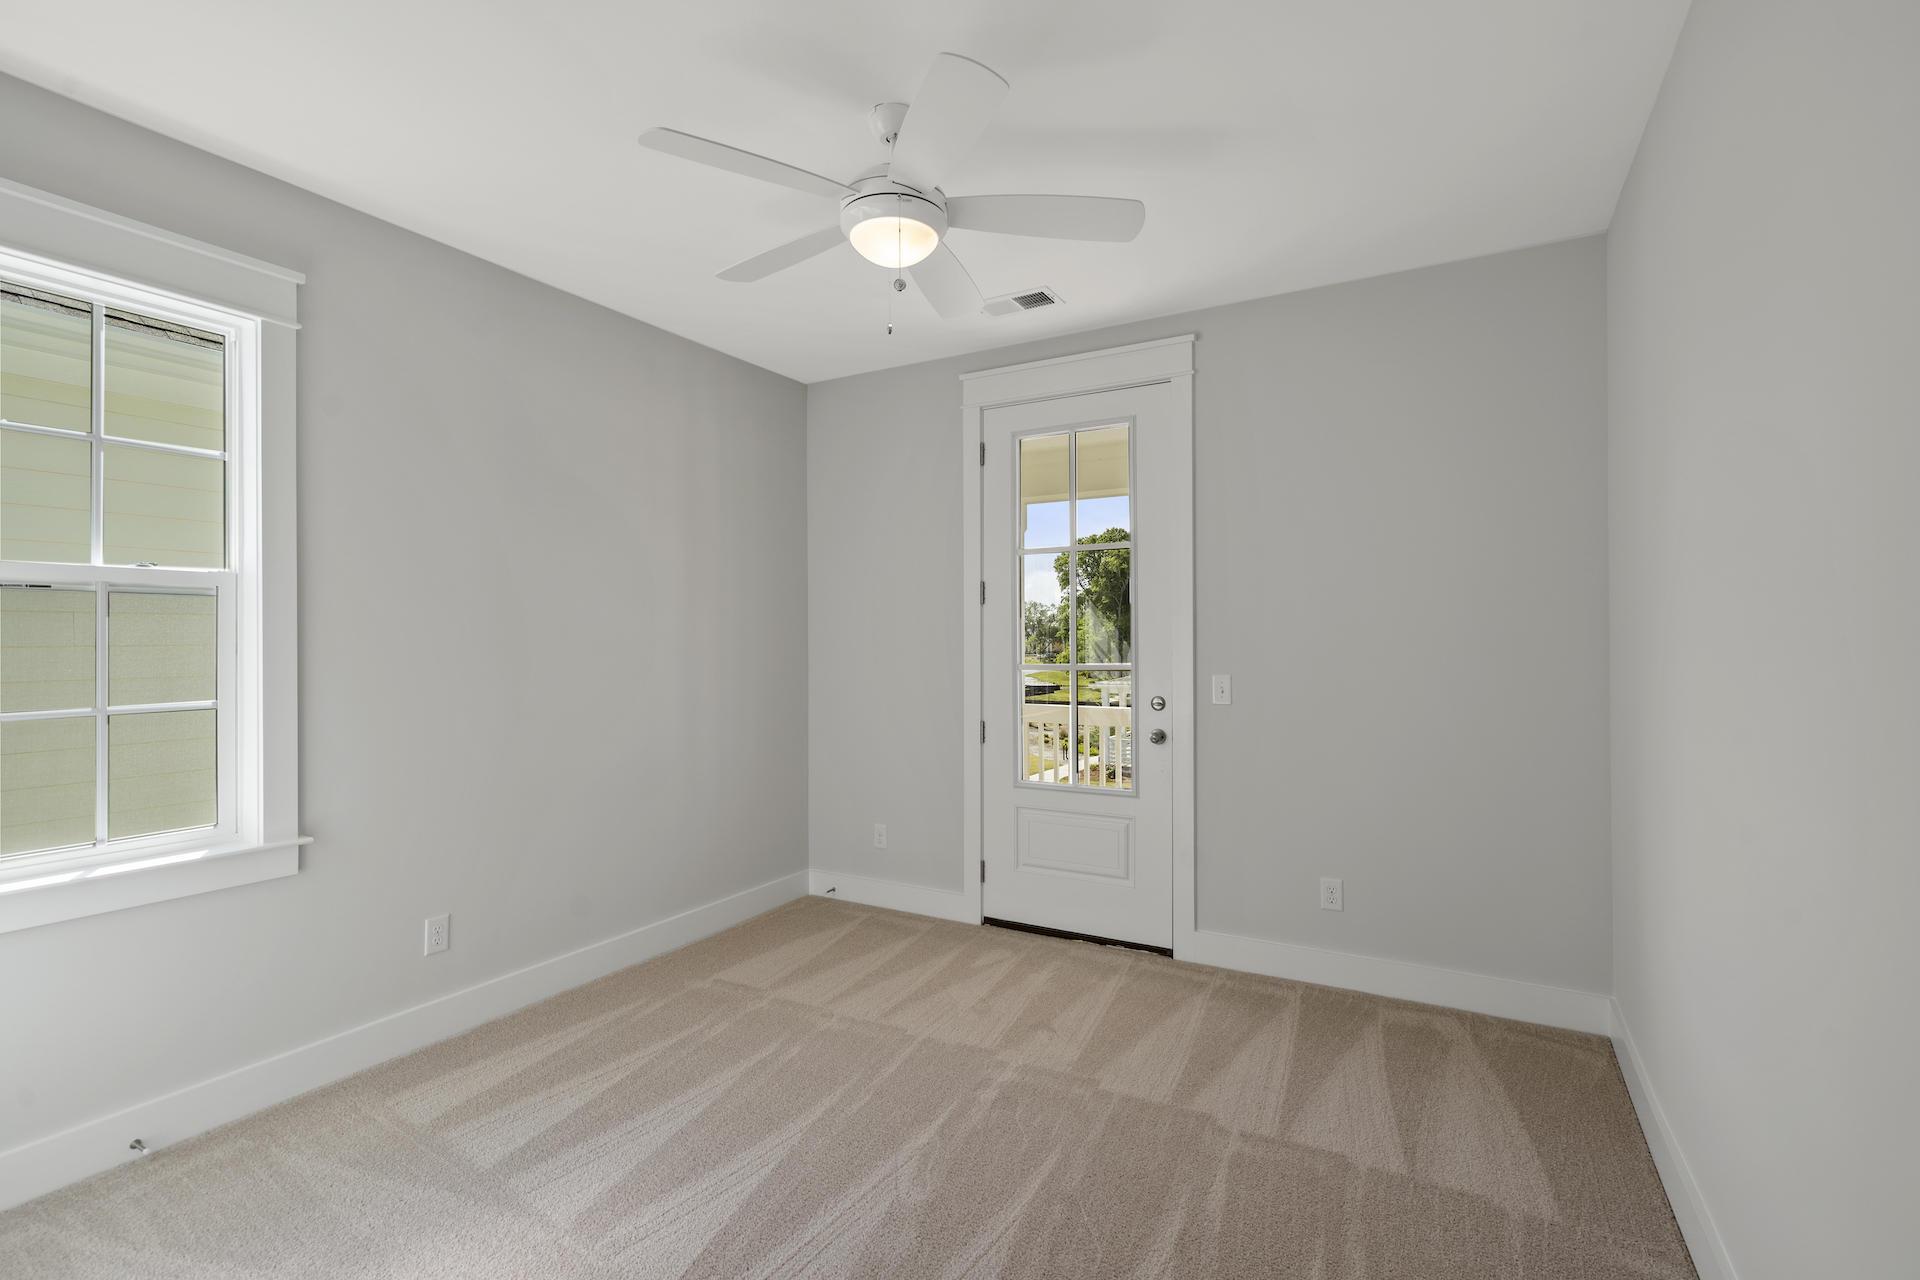 Midtown Homes For Sale - 1328 Upper Union, Mount Pleasant, SC - 7